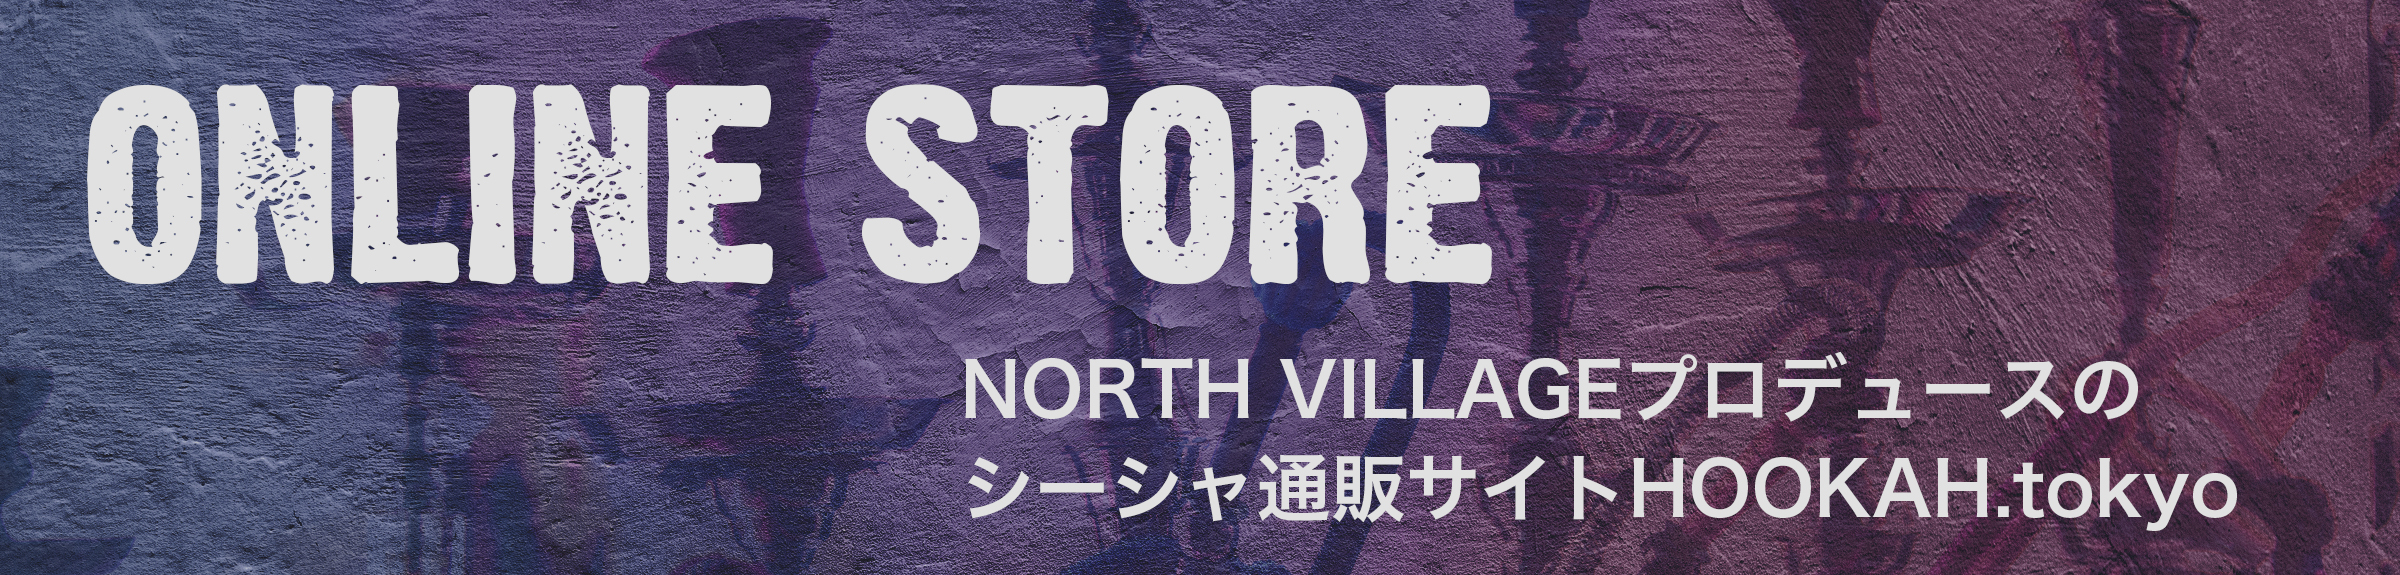 ONLINE STORE NORTH VILLAGEプロデュースのシーシャ通販サイト HOOKAH.tokyo